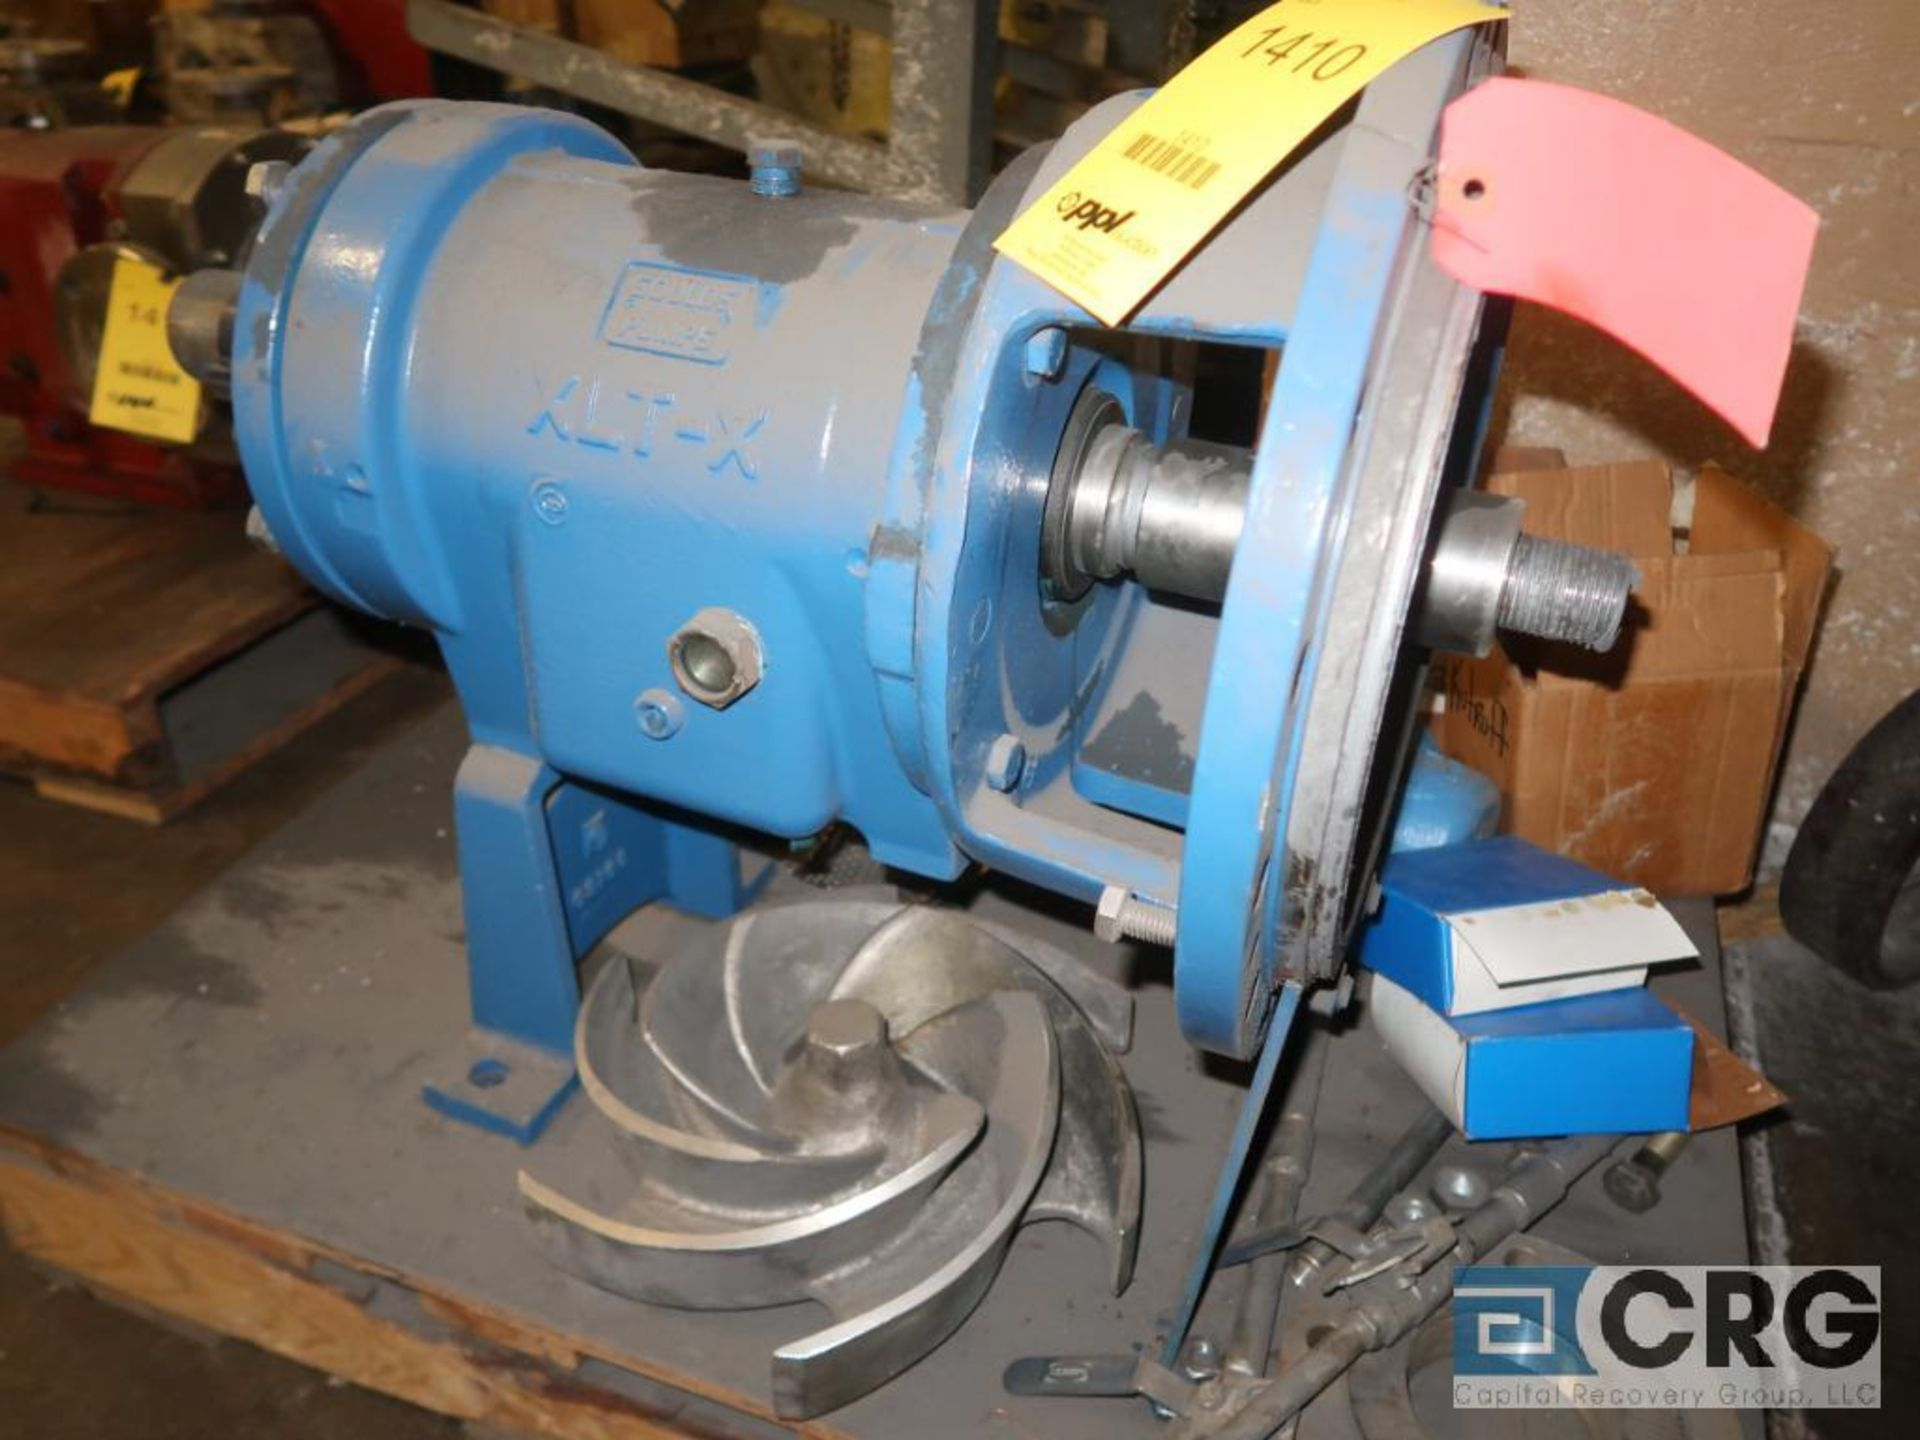 Goulds 3196 XLT pump (Basement Stores)